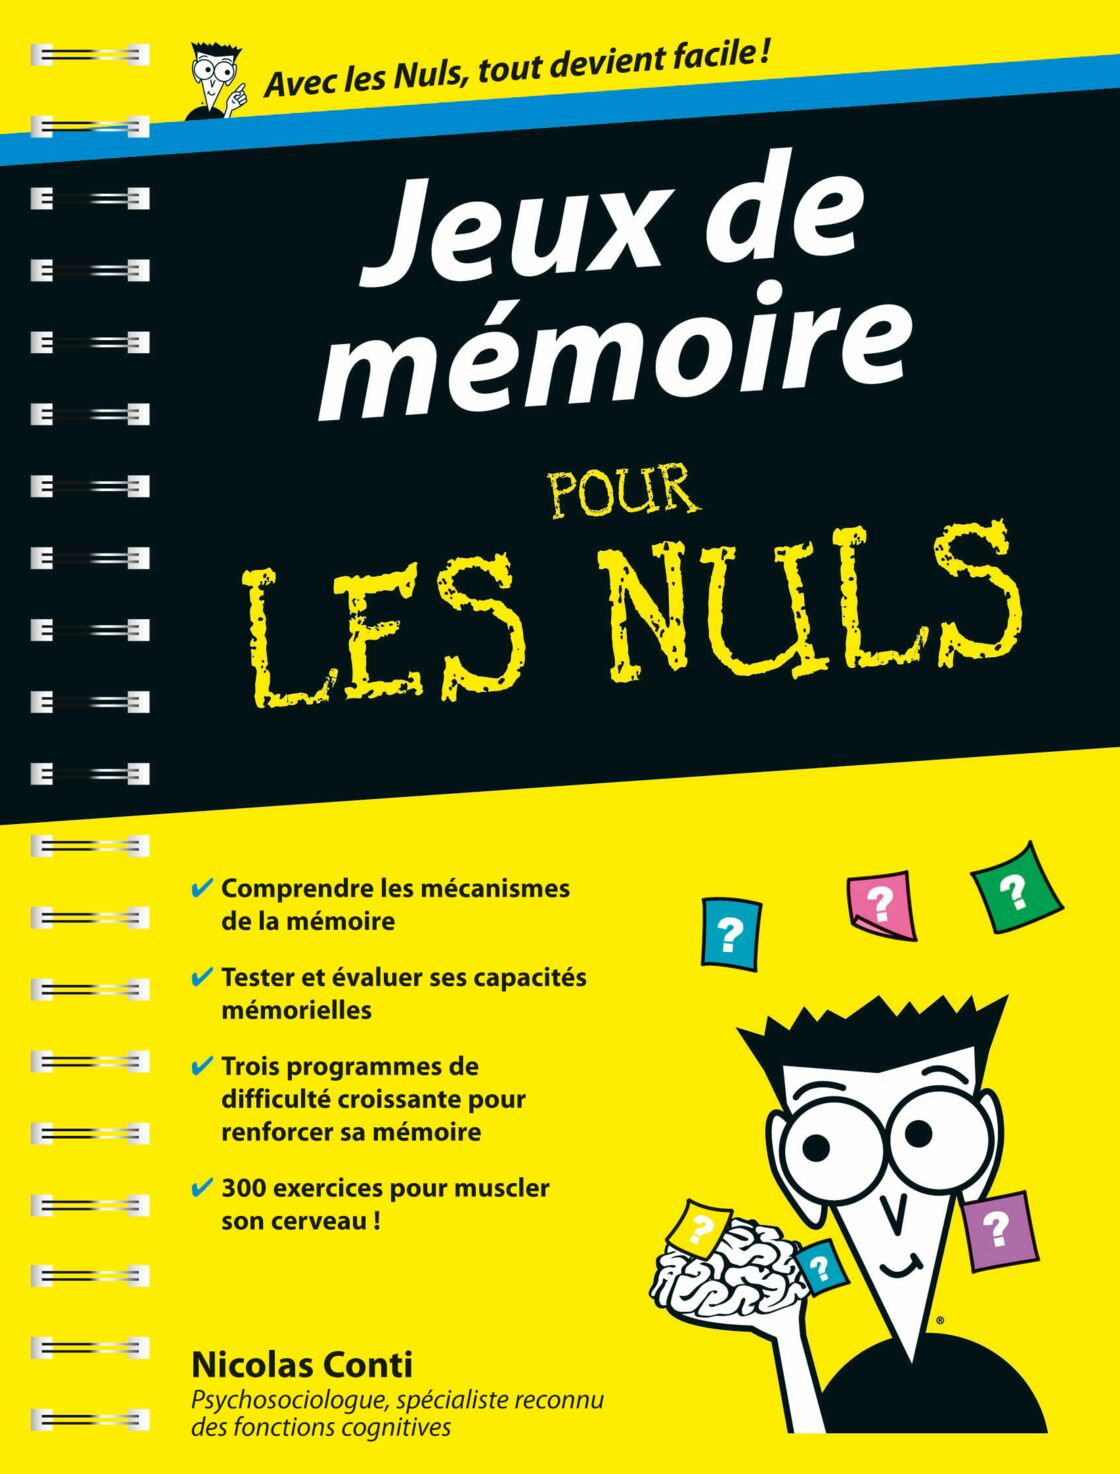 10 Exercices Pour Am U00e9liorer Sa M U00e9moire   Femme Actuelle Le Mag